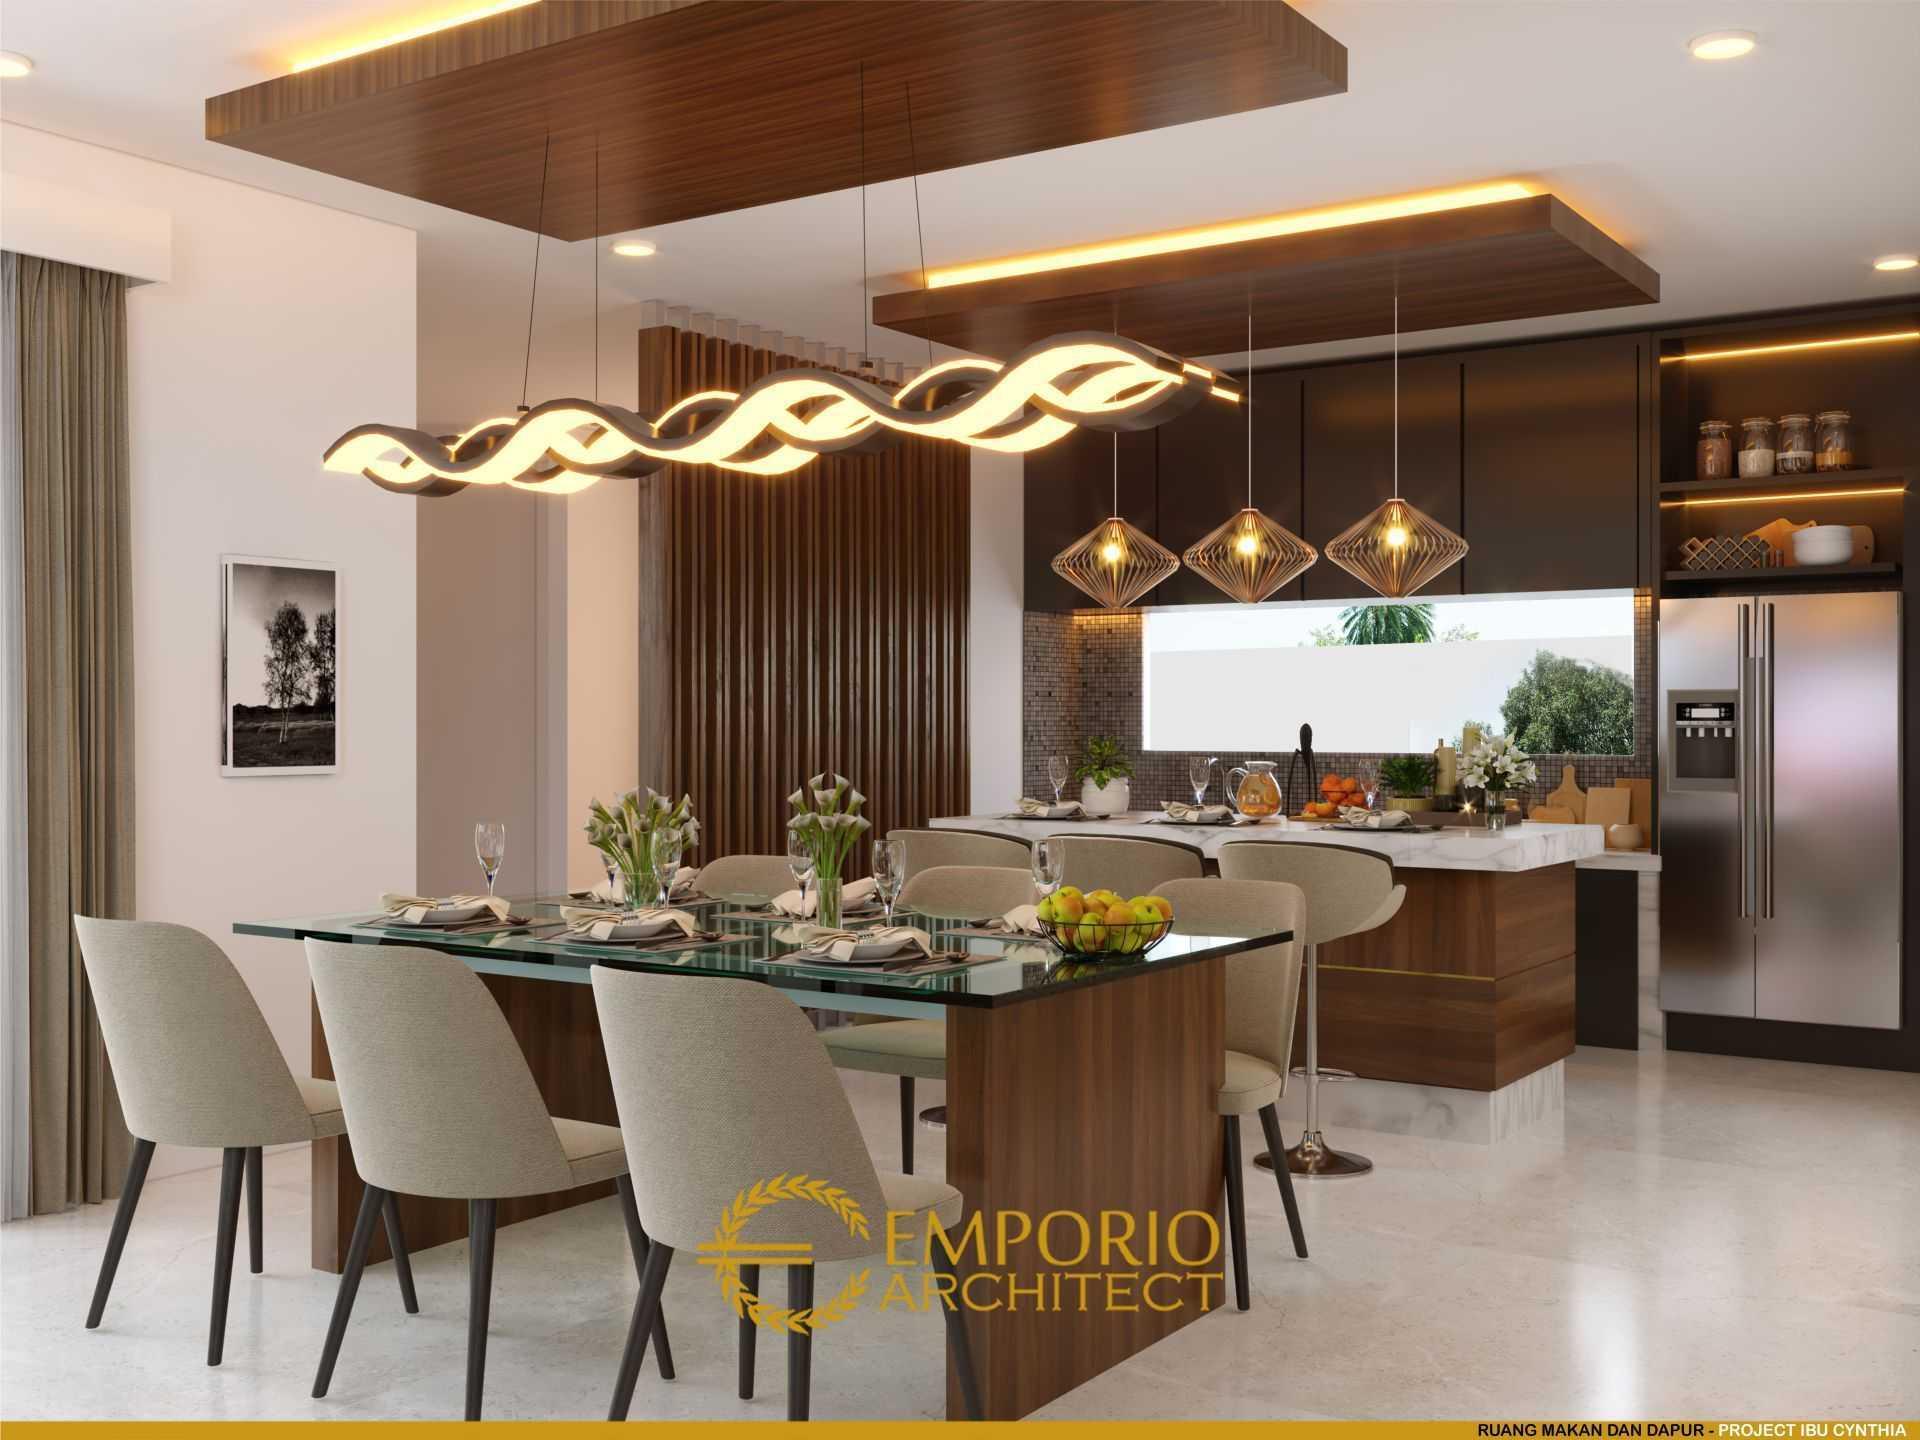 Emporio Architect Jasa Arsitek Pekanbaru Desain Rumah Modern 2 Lantai 824 Di Pekanbaru, Riau Pekanbaru, Kota Pekanbaru, Riau, Indonesia Pekanbaru, Kota Pekanbaru, Riau, Indonesia Emporio-Architect-Jasa-Arsitek-Pekanbaru-Desain-Rumah-Modern-2-Lantai-824-Di-Pekanbaru-Riau  94136